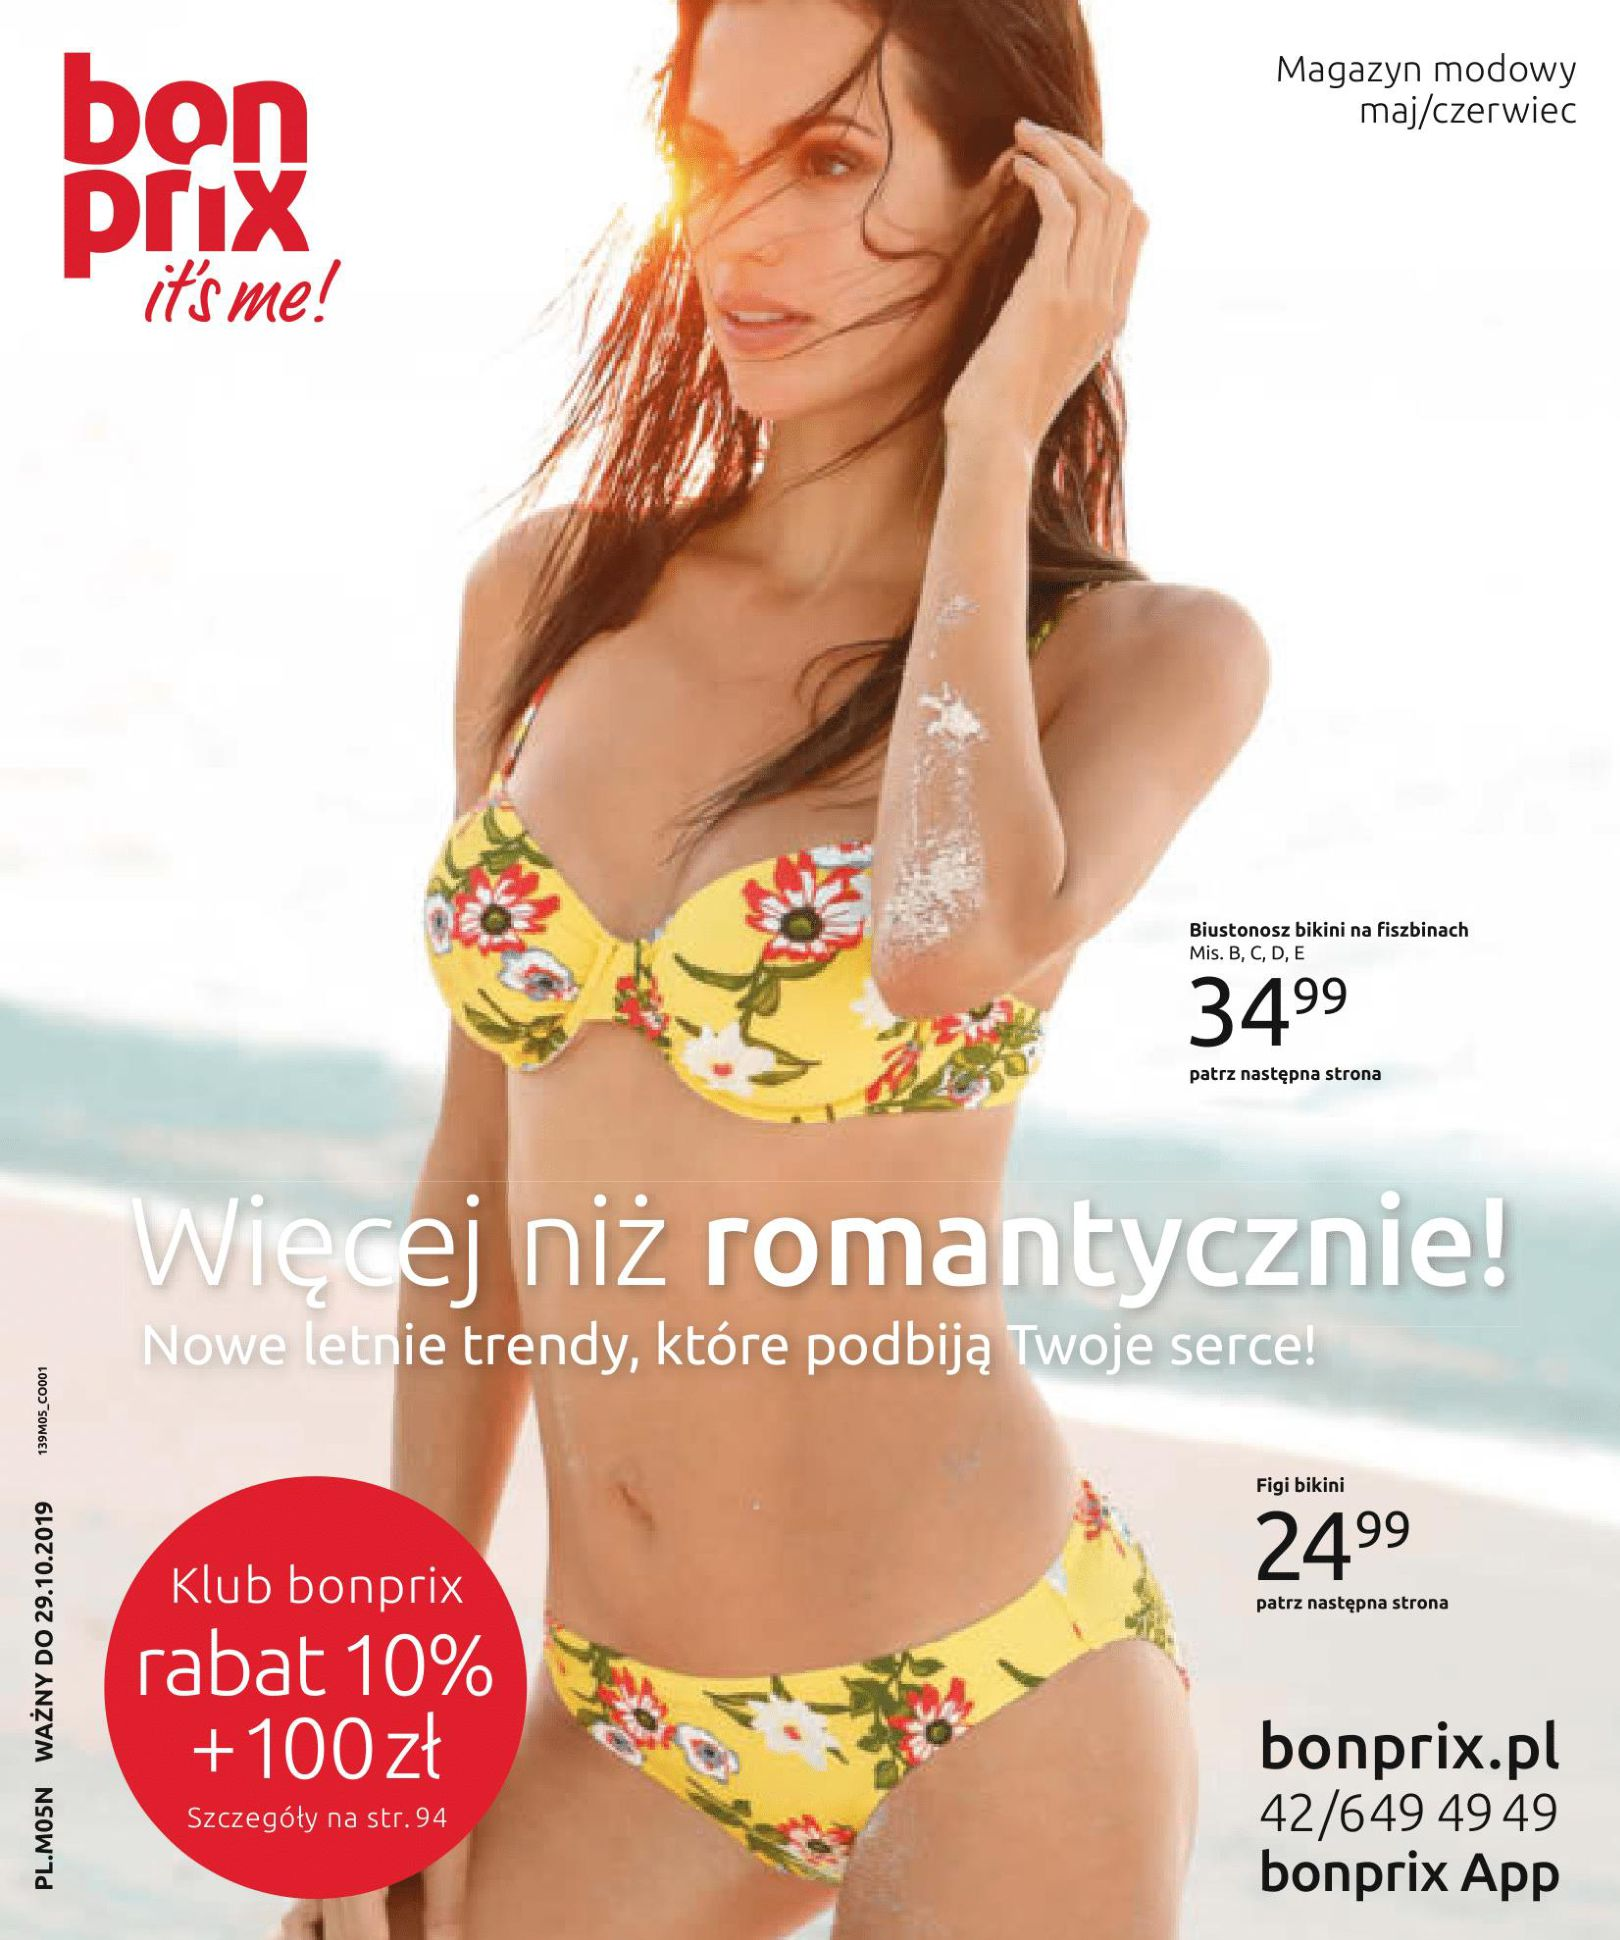 Gazetka Bonprix - Romantic Summer-02.07.2019-29.10.2019-page-1